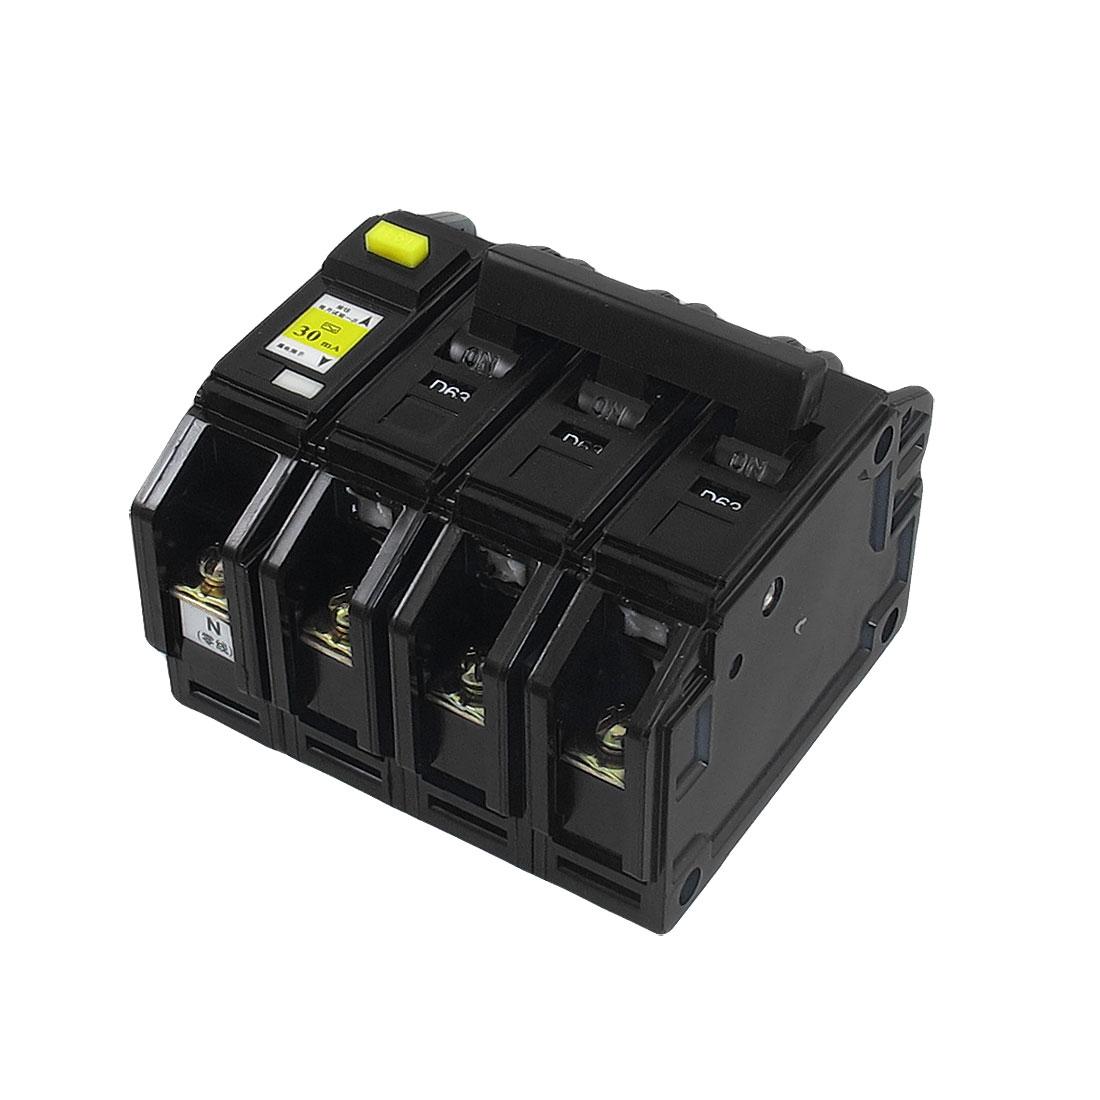 DZ12LE AC 220V/380V 63A 3P+N ELCB Earth Leakage Circuit Breaker